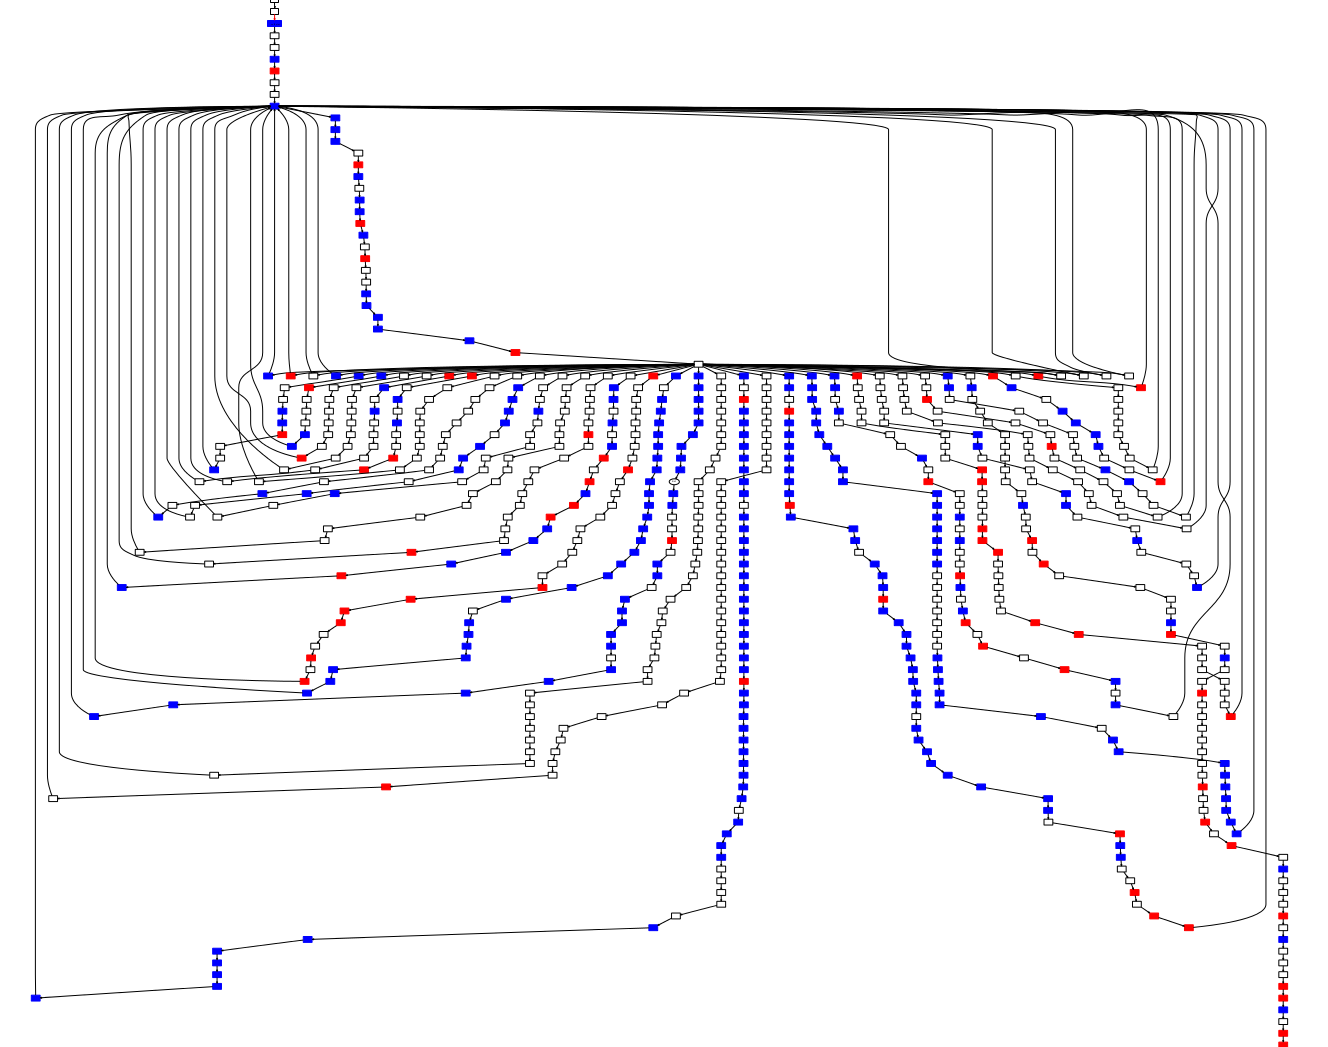 lynx: Analysis and Reverse Engineering Malware Code